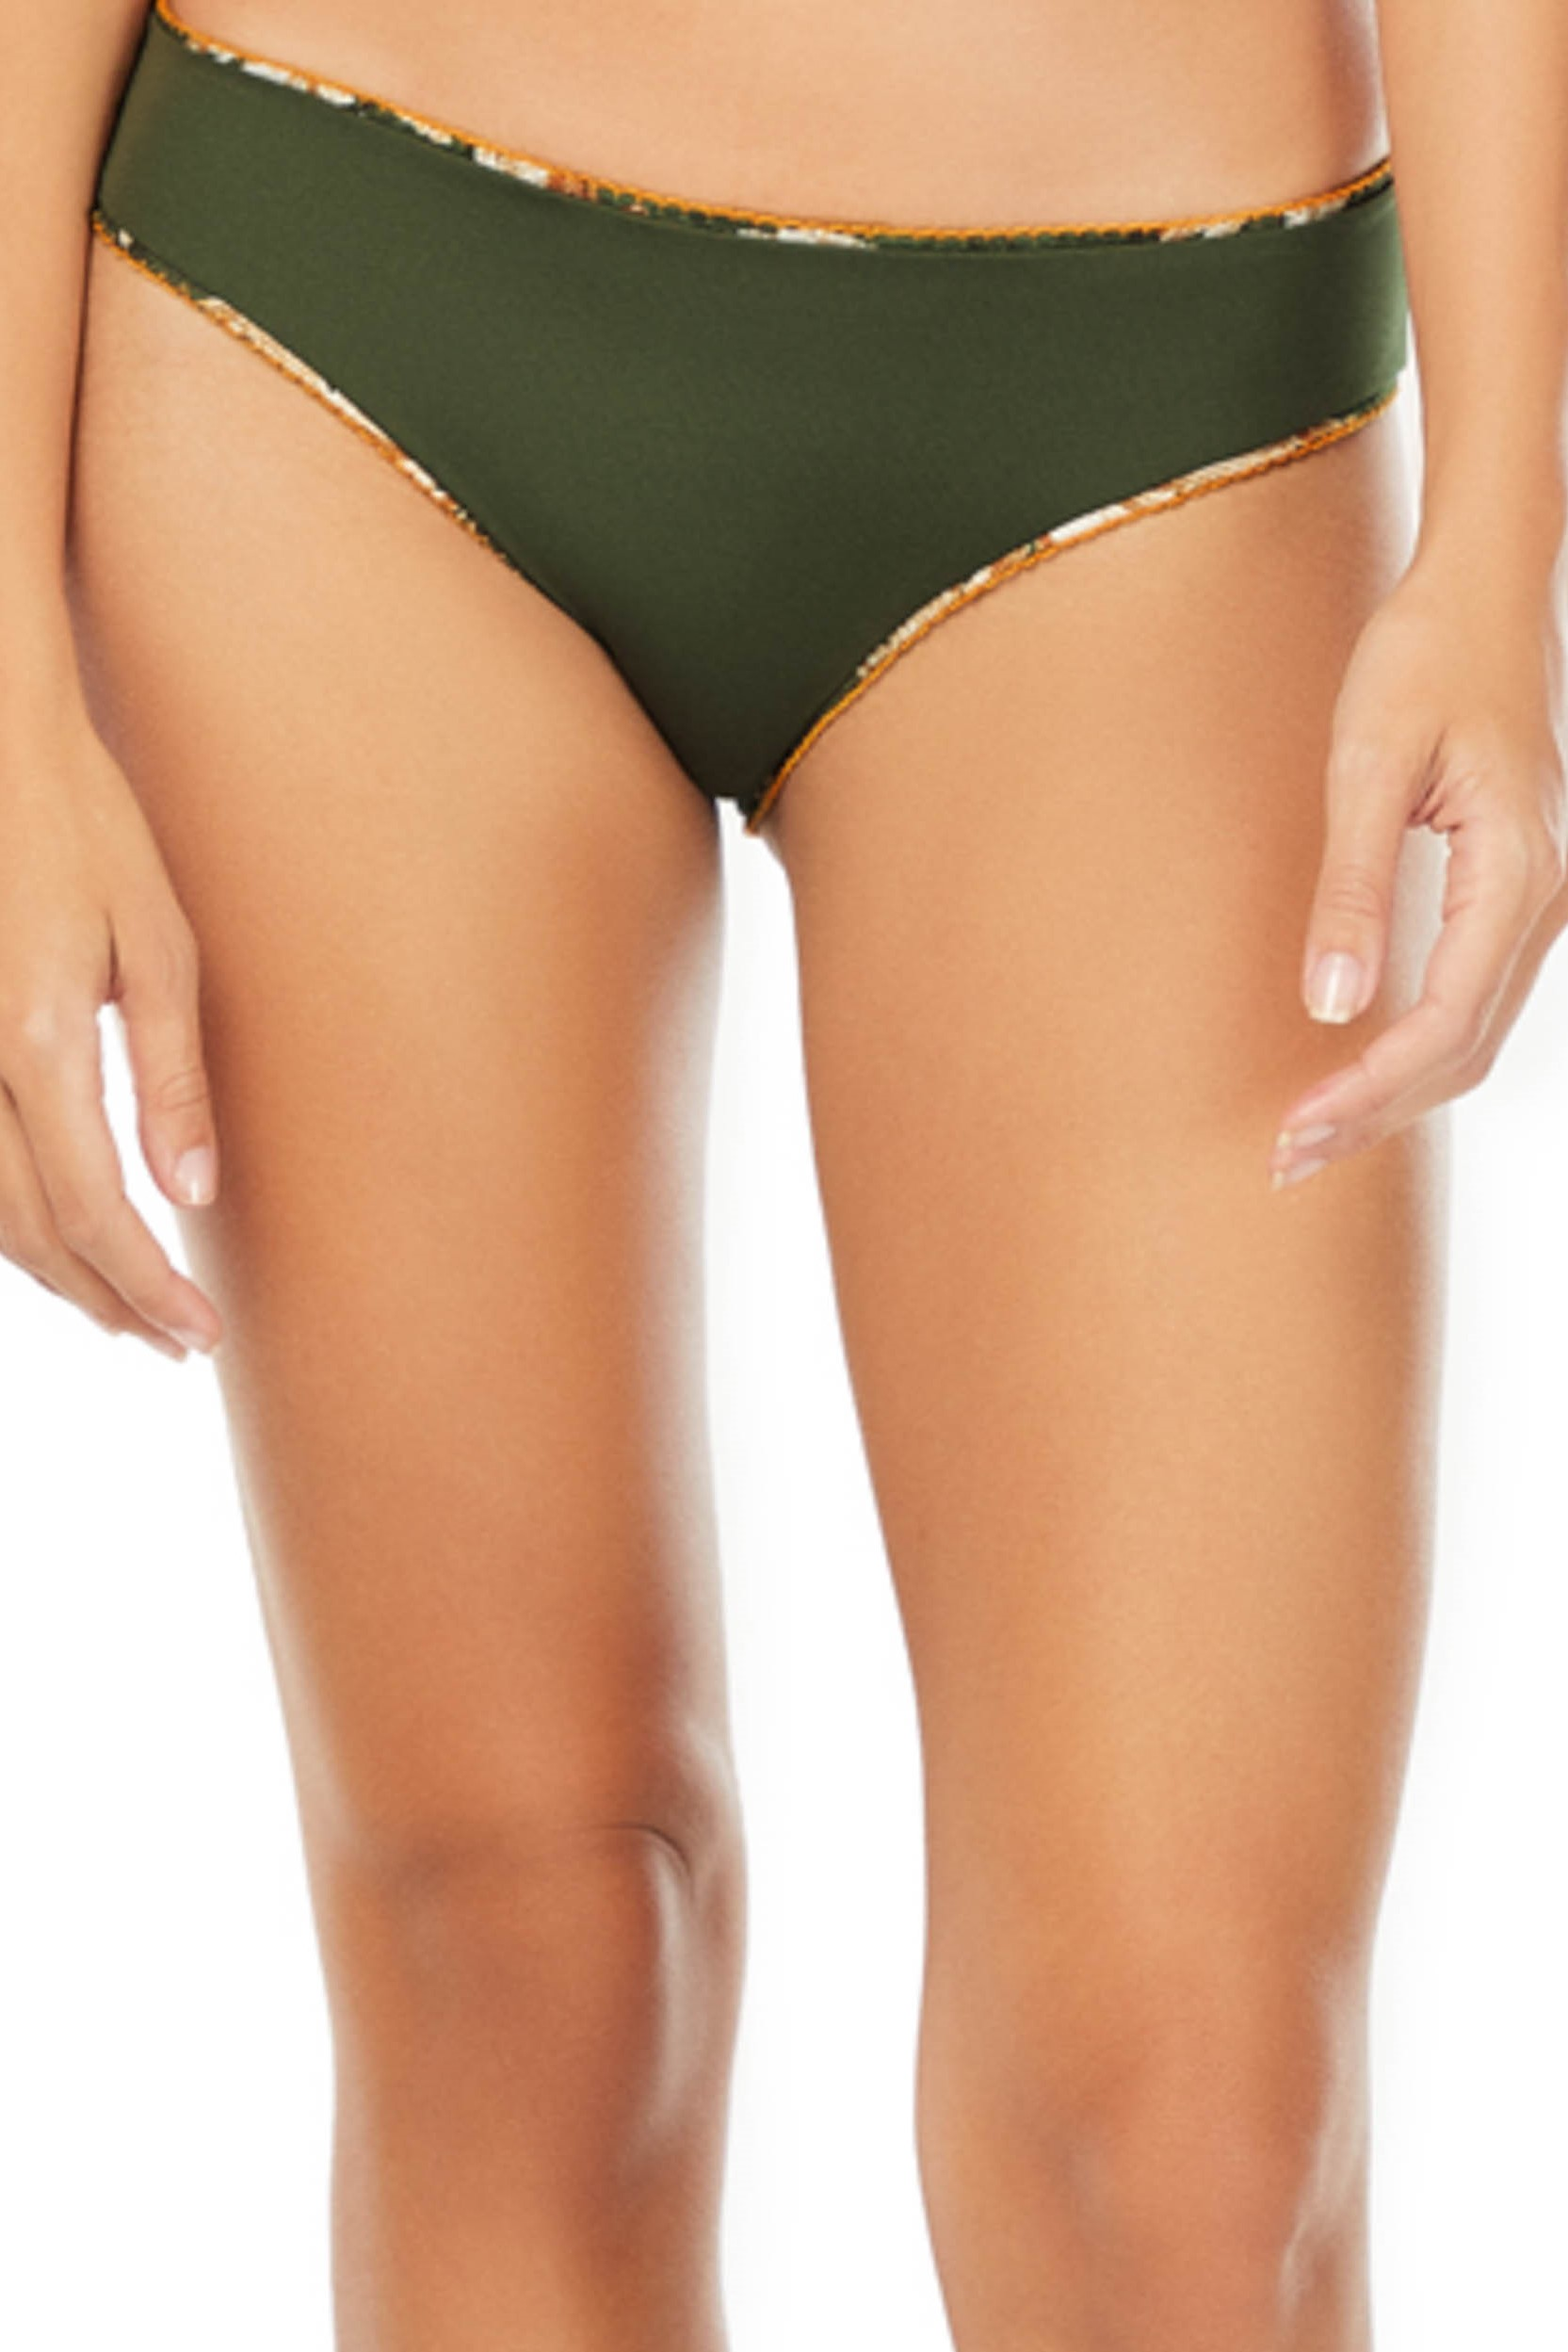 Cosita Linda Haere Mai Full Bikini Bottom